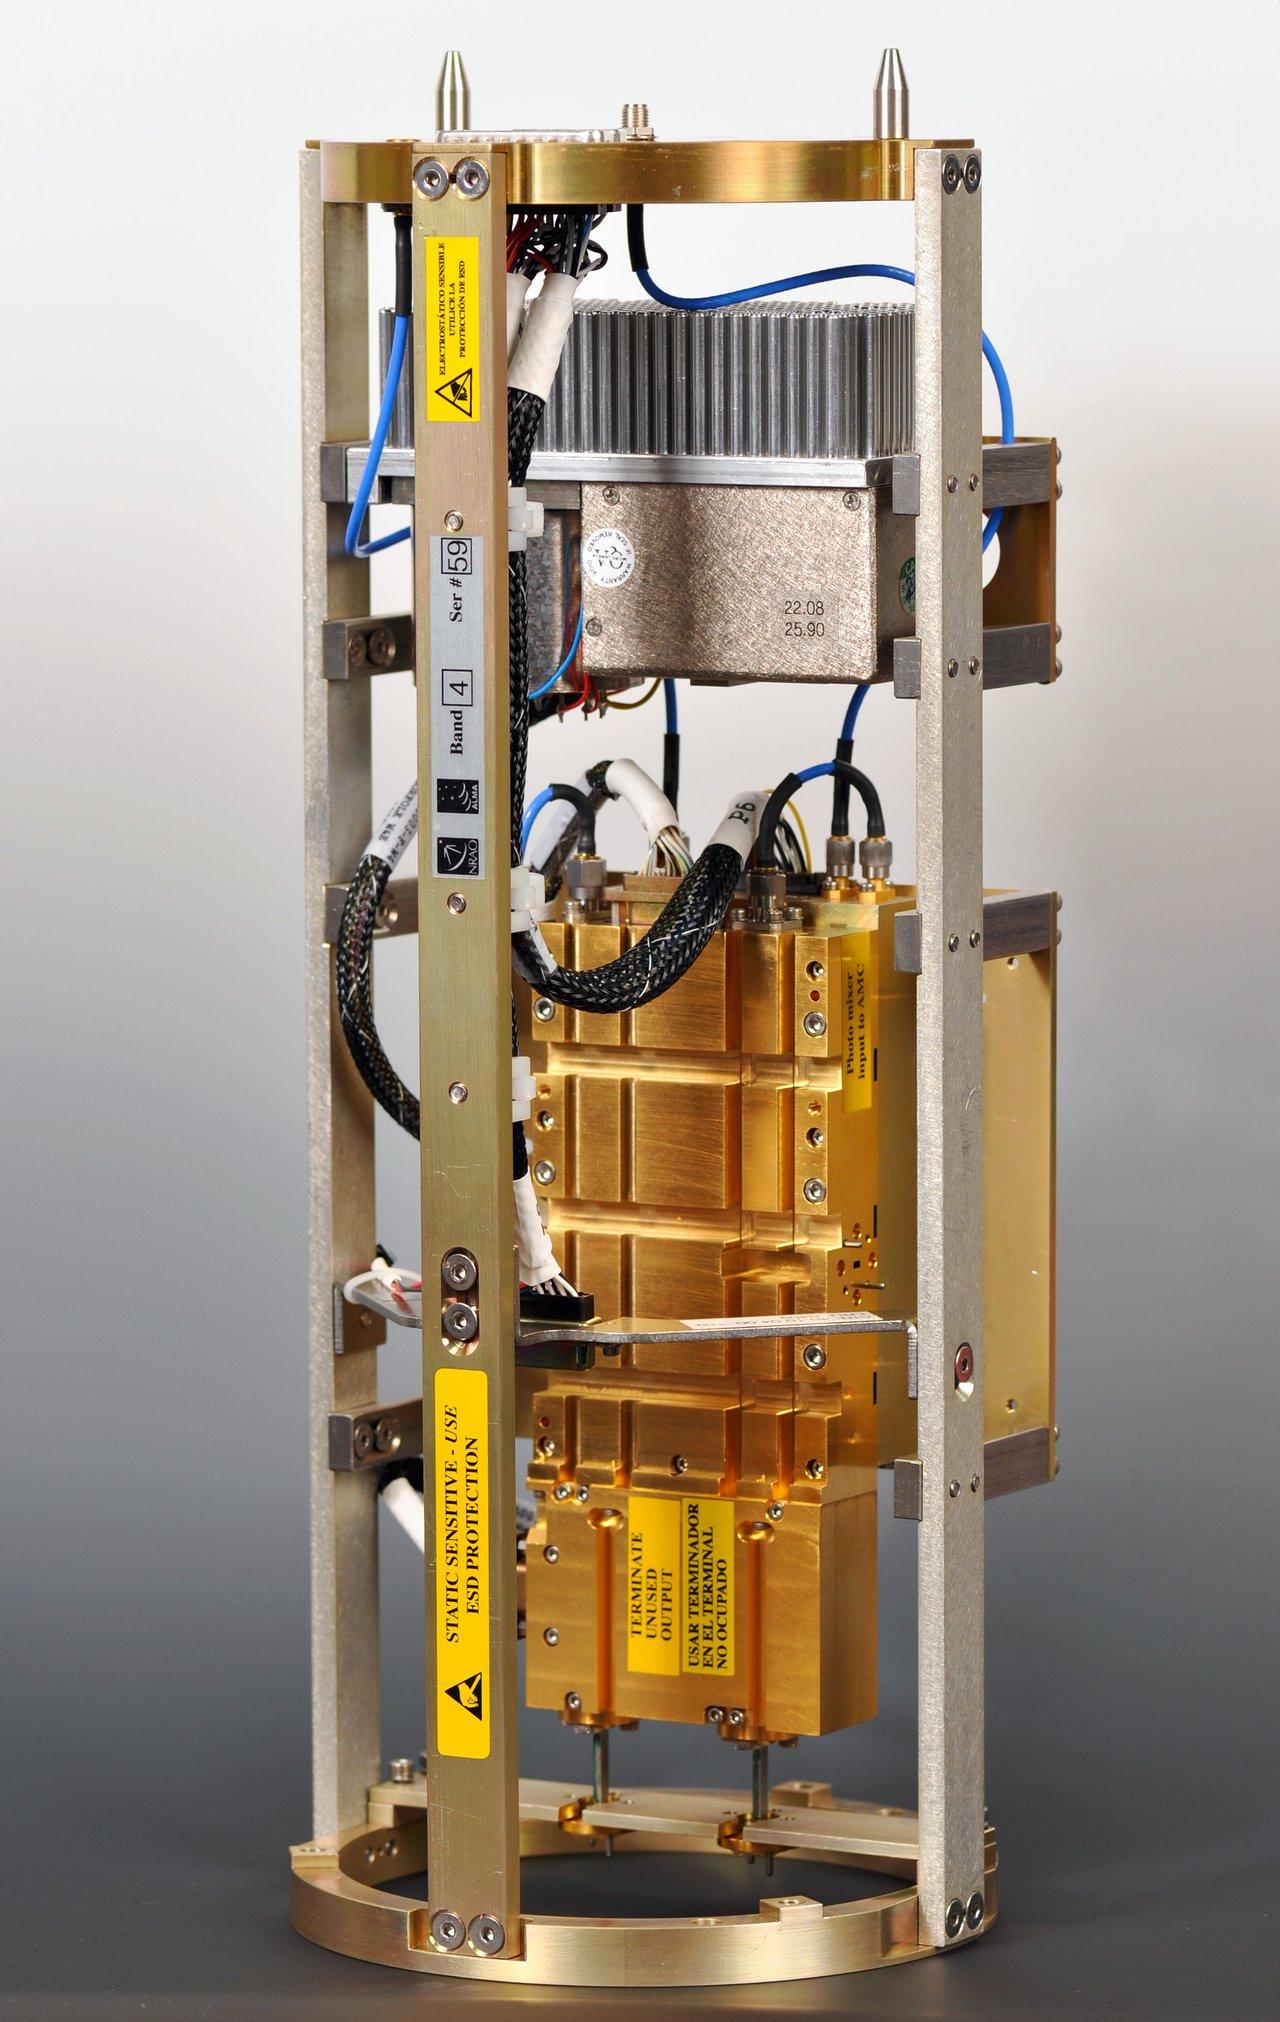 Un receptor WCA (Warm Cartridge Assembly) de ALMA